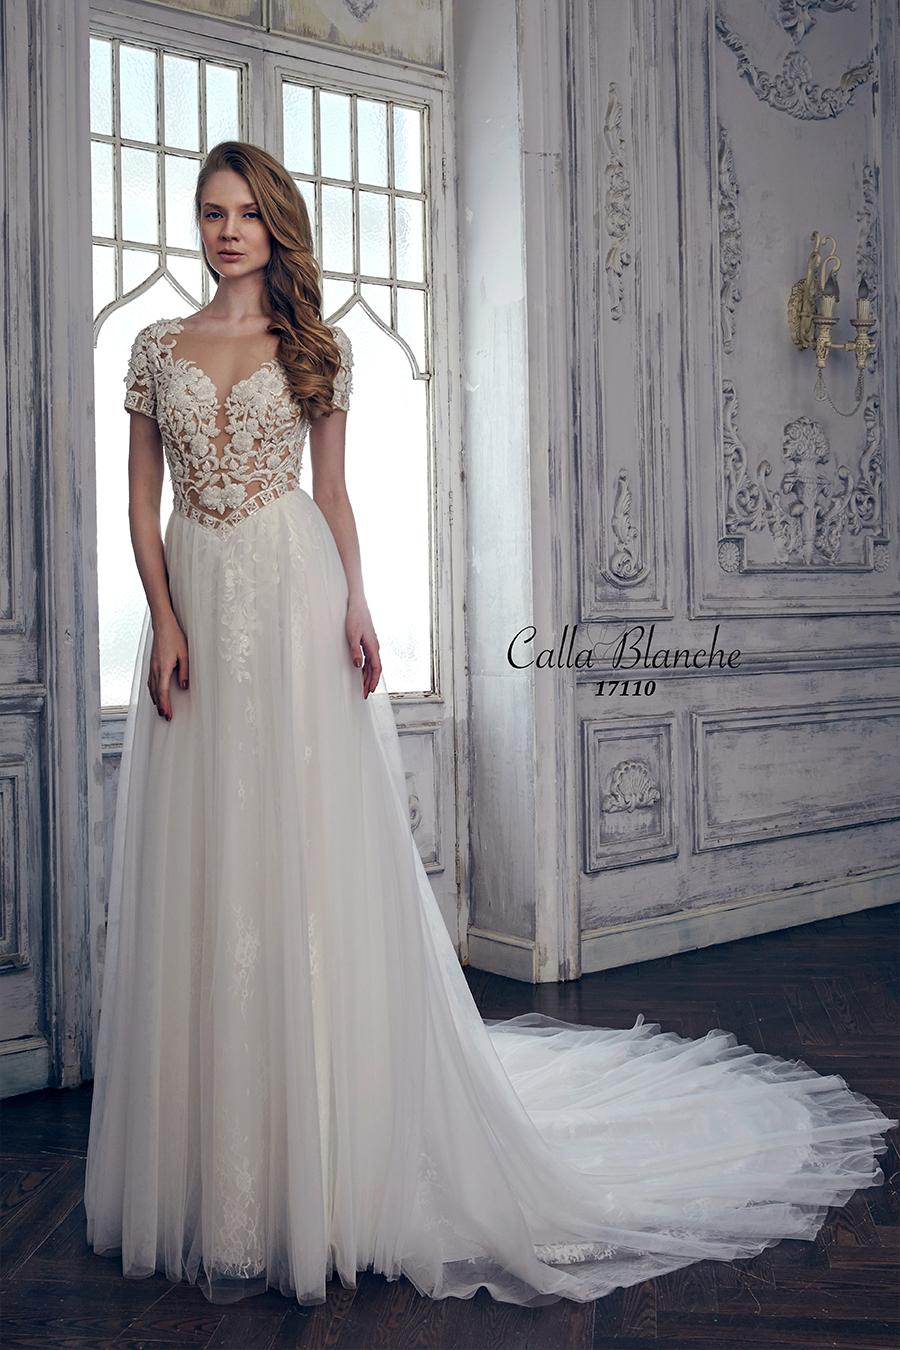 Designer Bridal Gown Rental Malaysia   Saddha